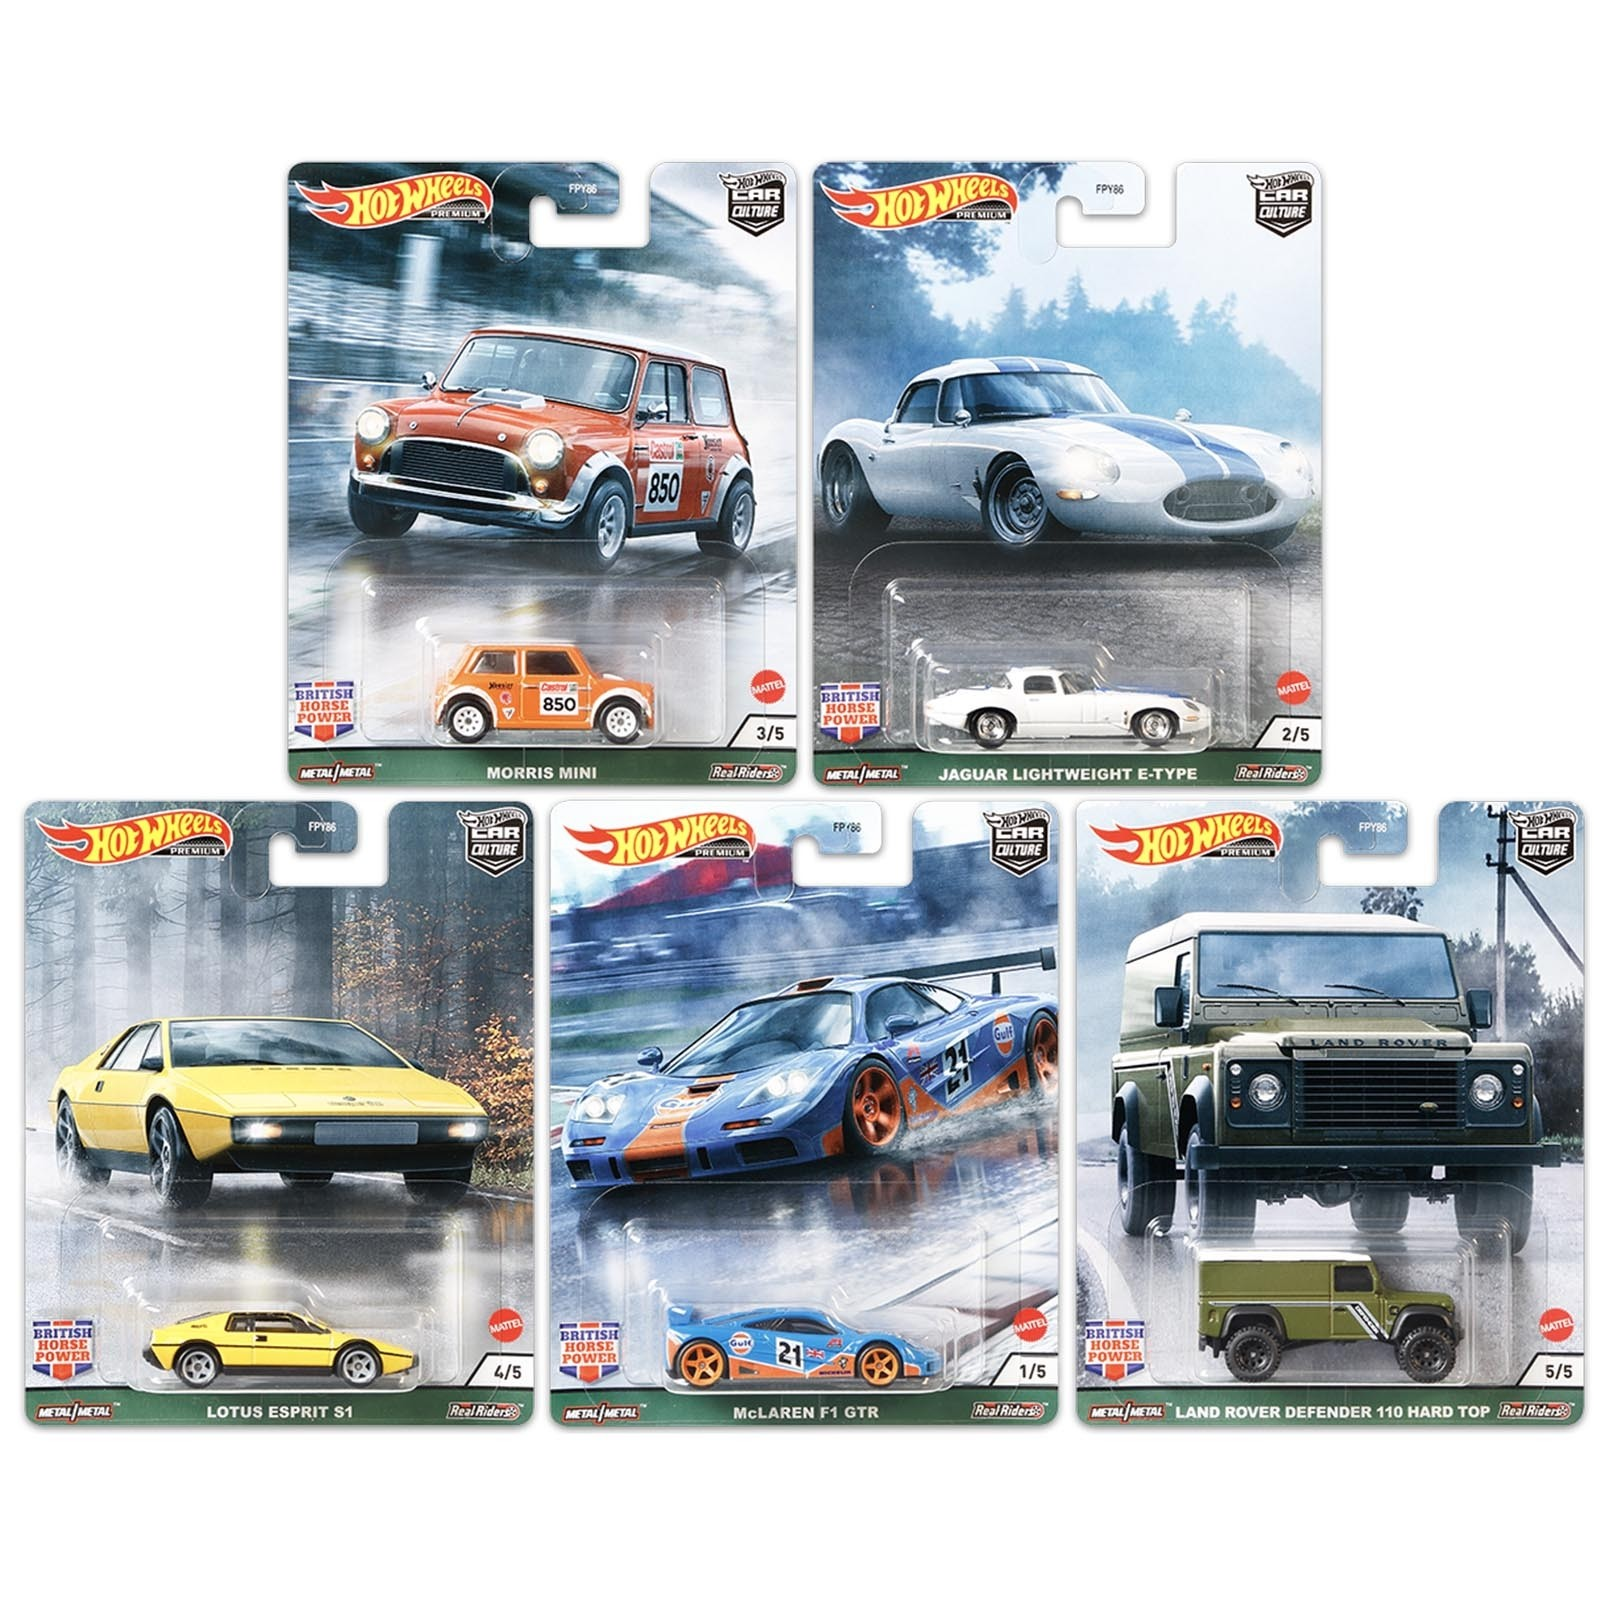 Hot Wheels Set Completo 5 Miniaturas British Horse Power Car Culture Fpy86 Escala Miniaturas By Mao Na Roda 4x4